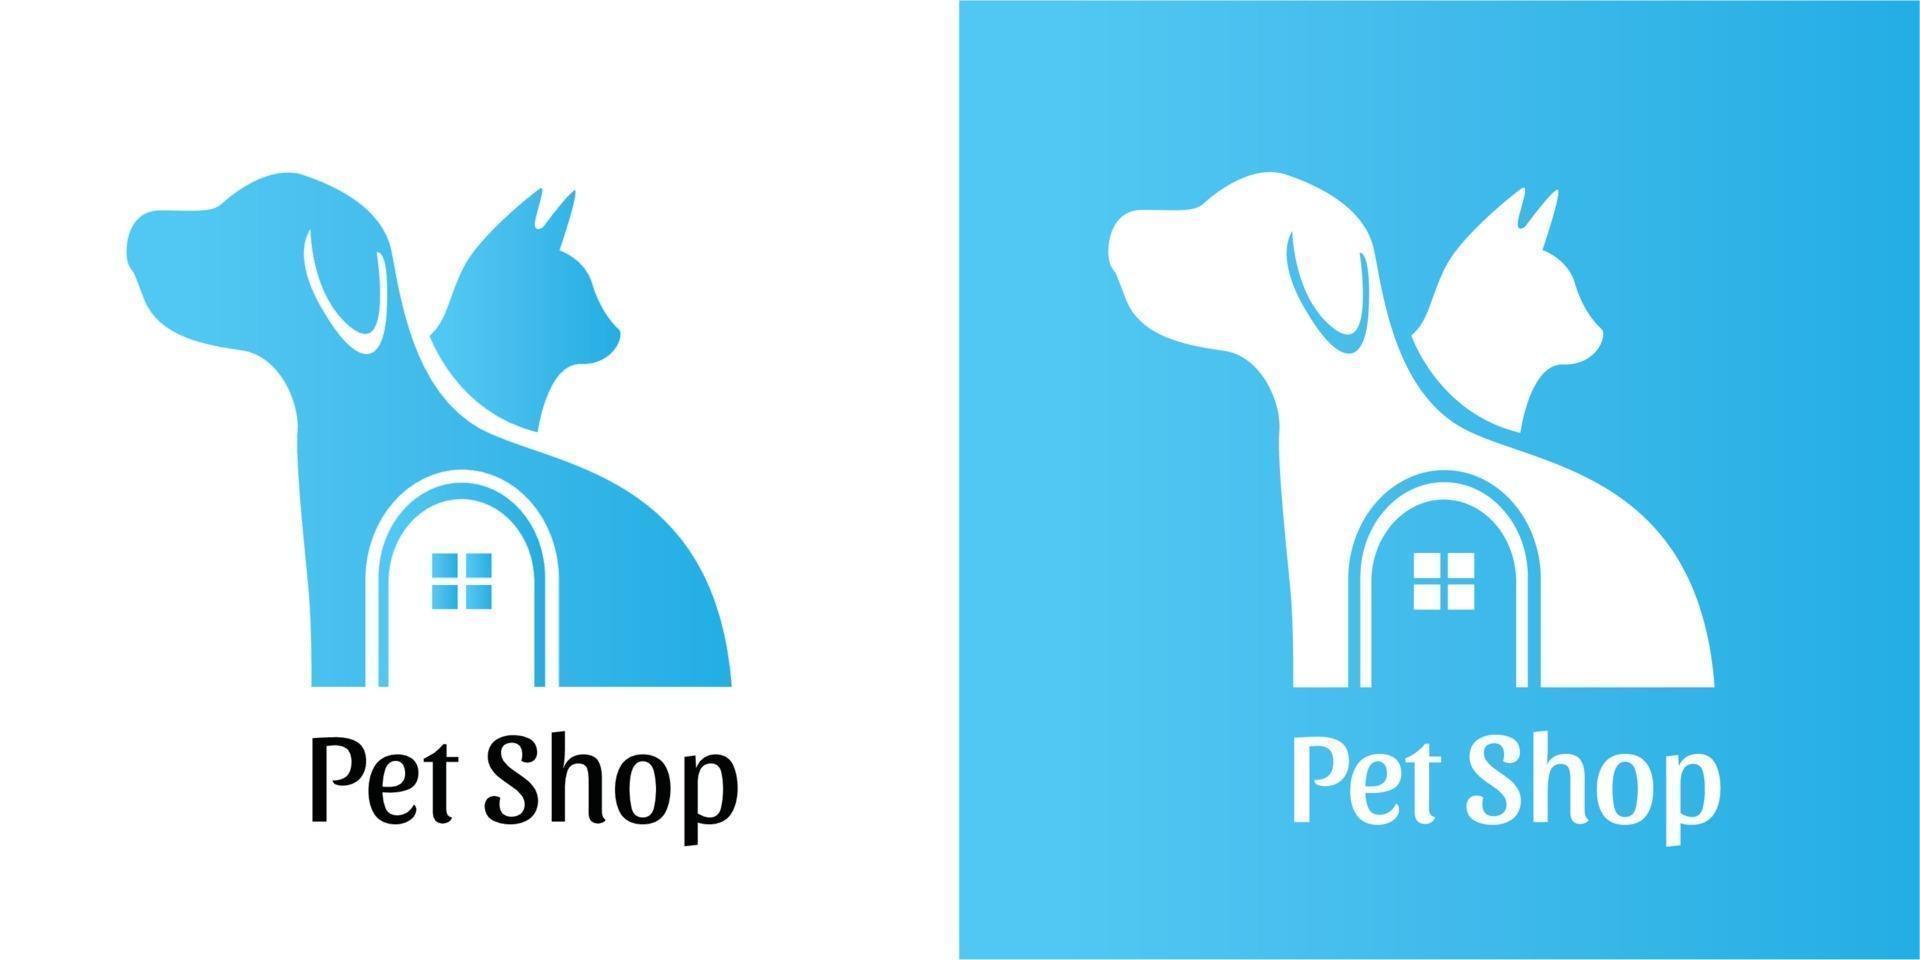 Pet Shop Simple Flat Negative Logo Dog and Cat Design Vector Illustration for business, company